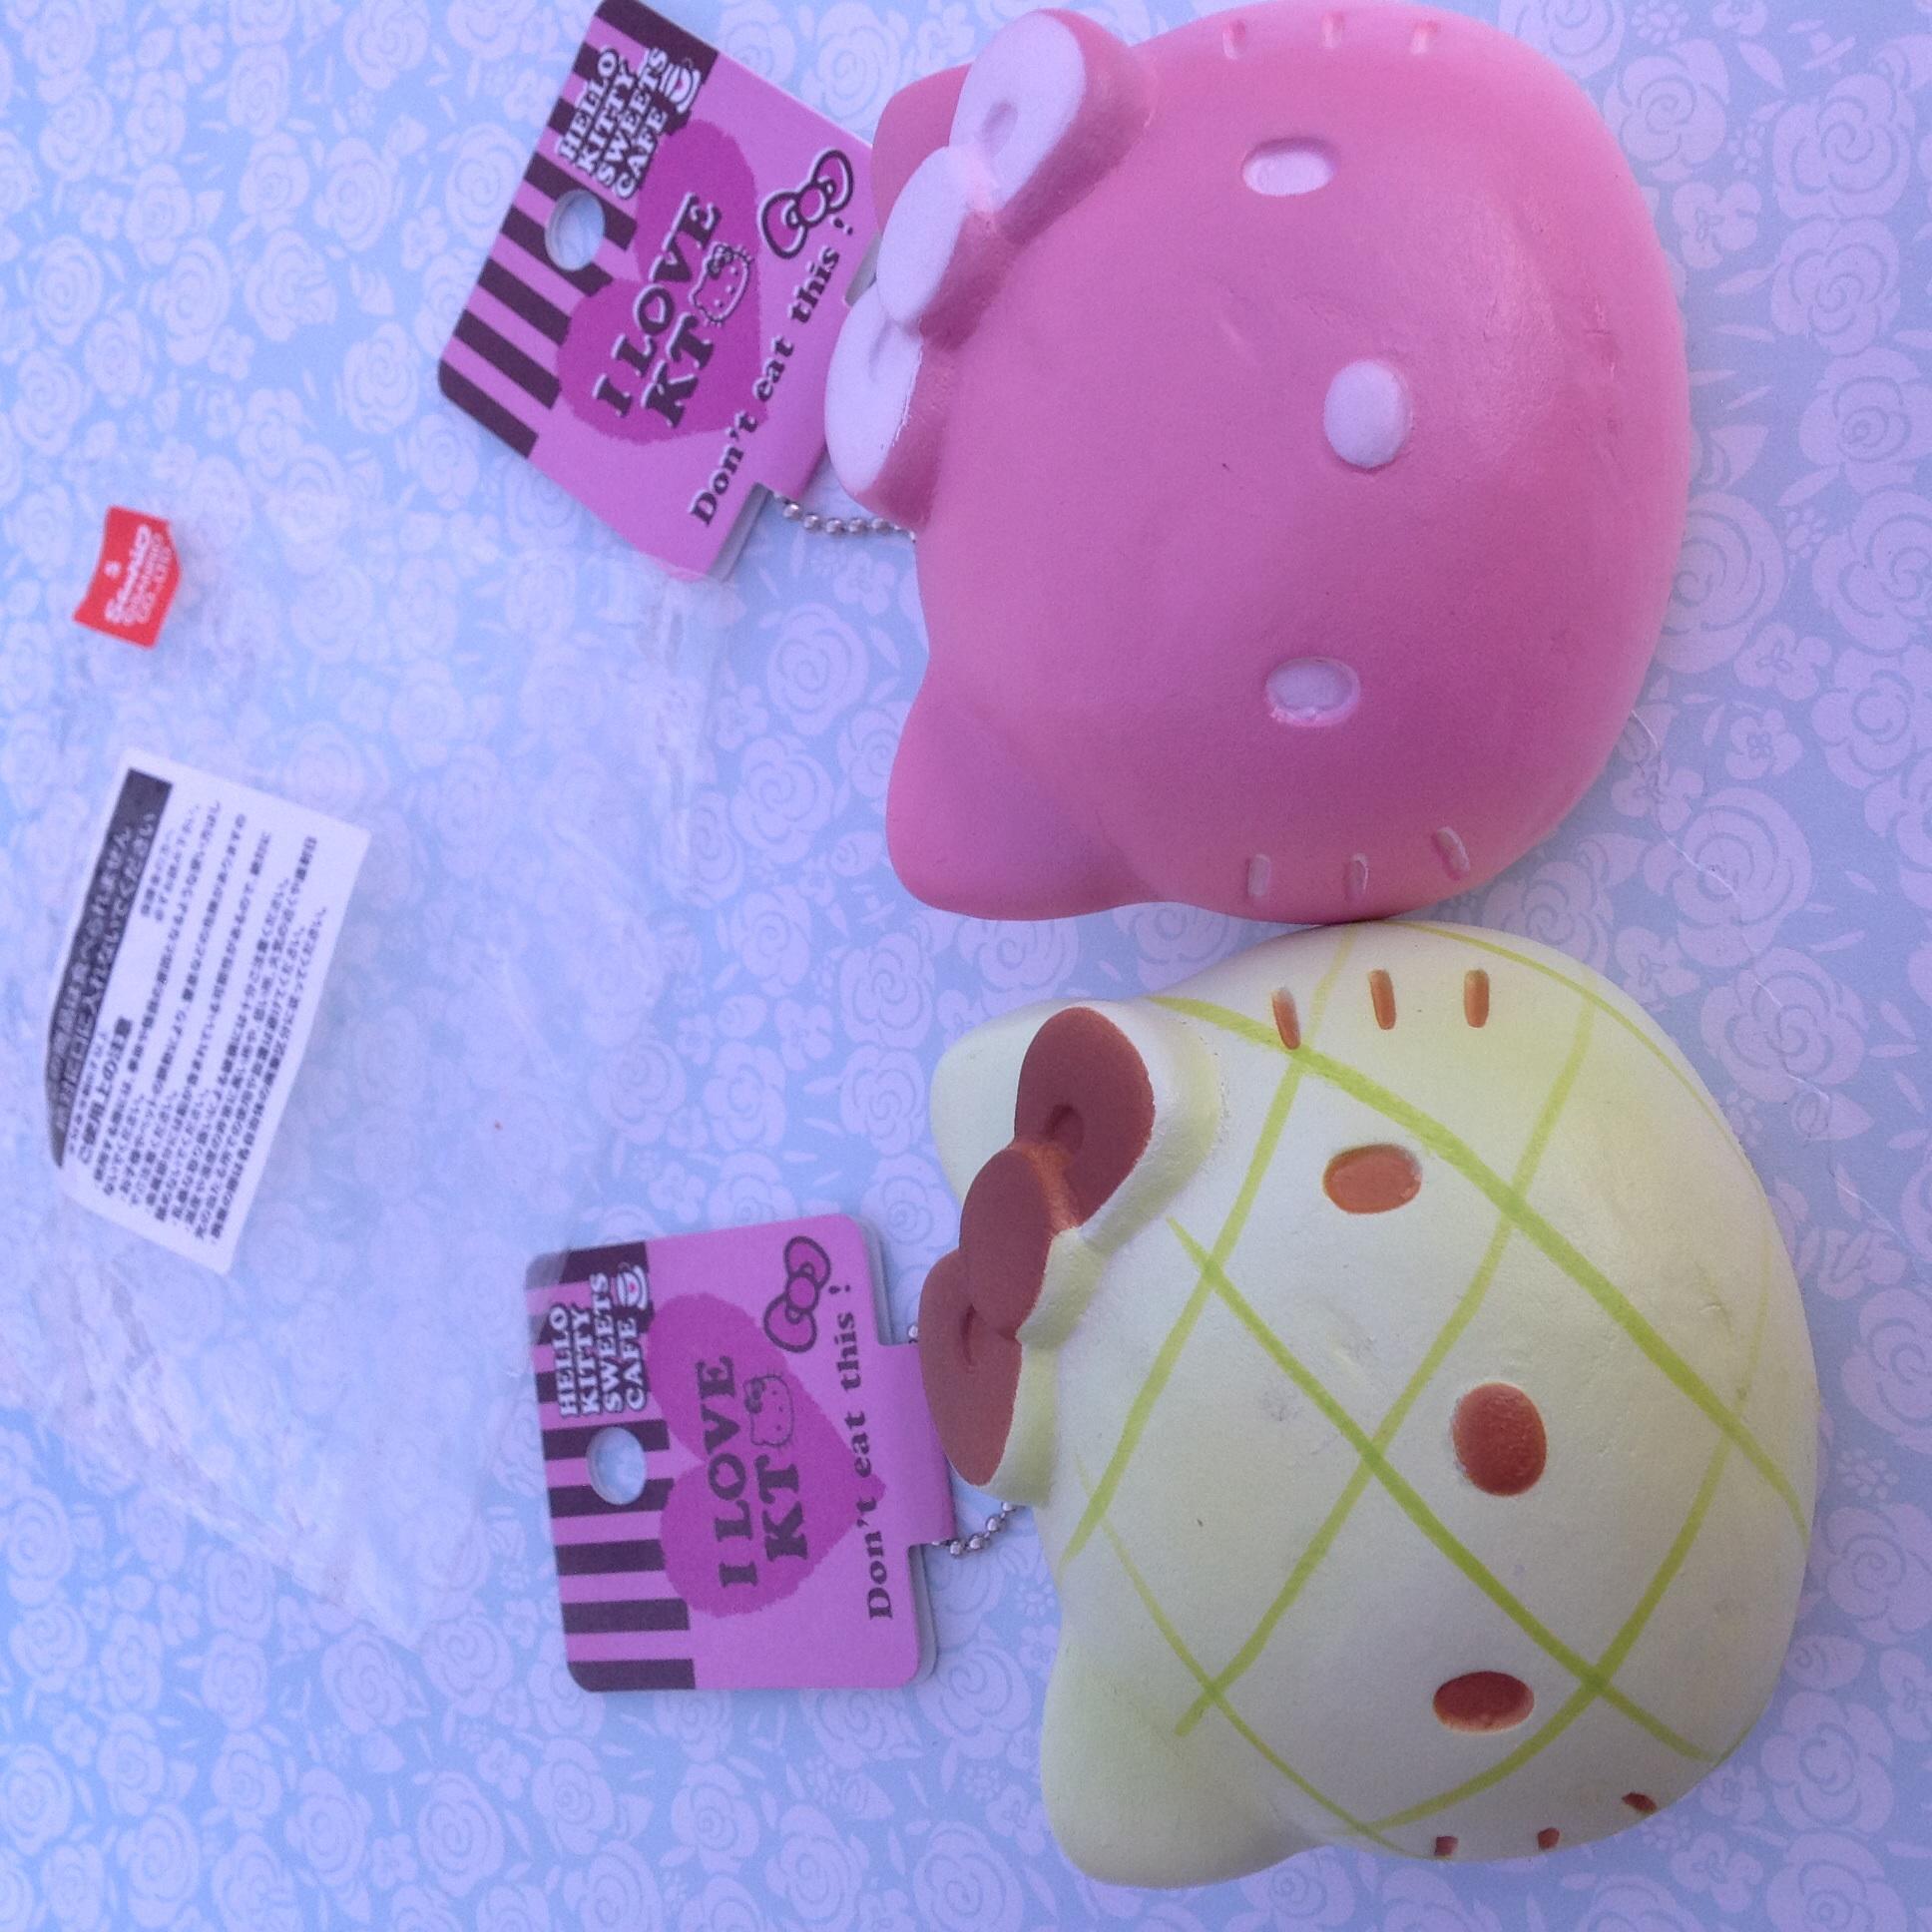 Squishy Head Bun : Rare Hello kitty head bun squishy ? SuzyCupcake ? Online Store Powered by Storenvy